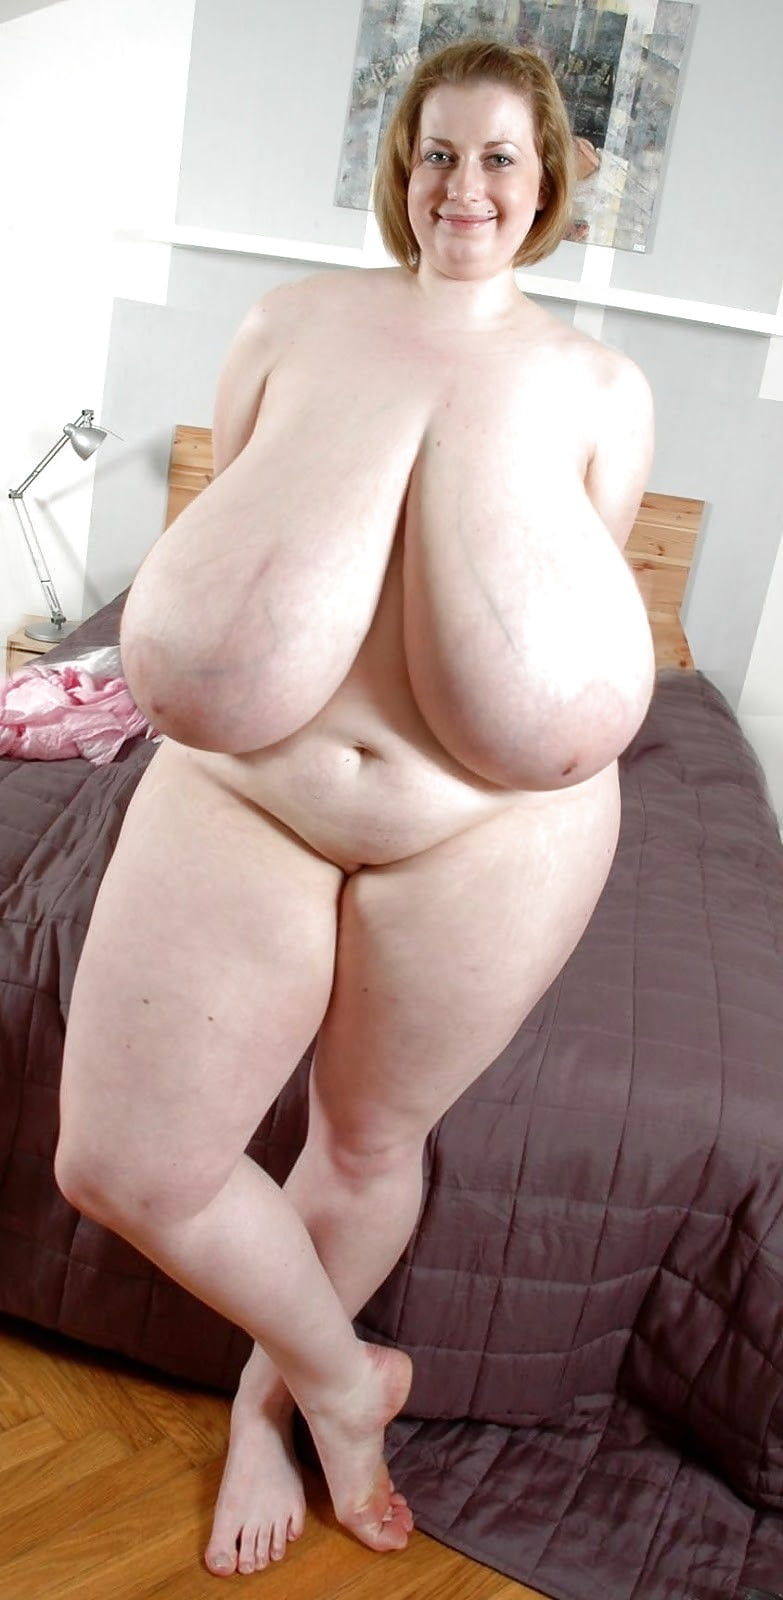 Ssbbw Huge Amateur Breasts